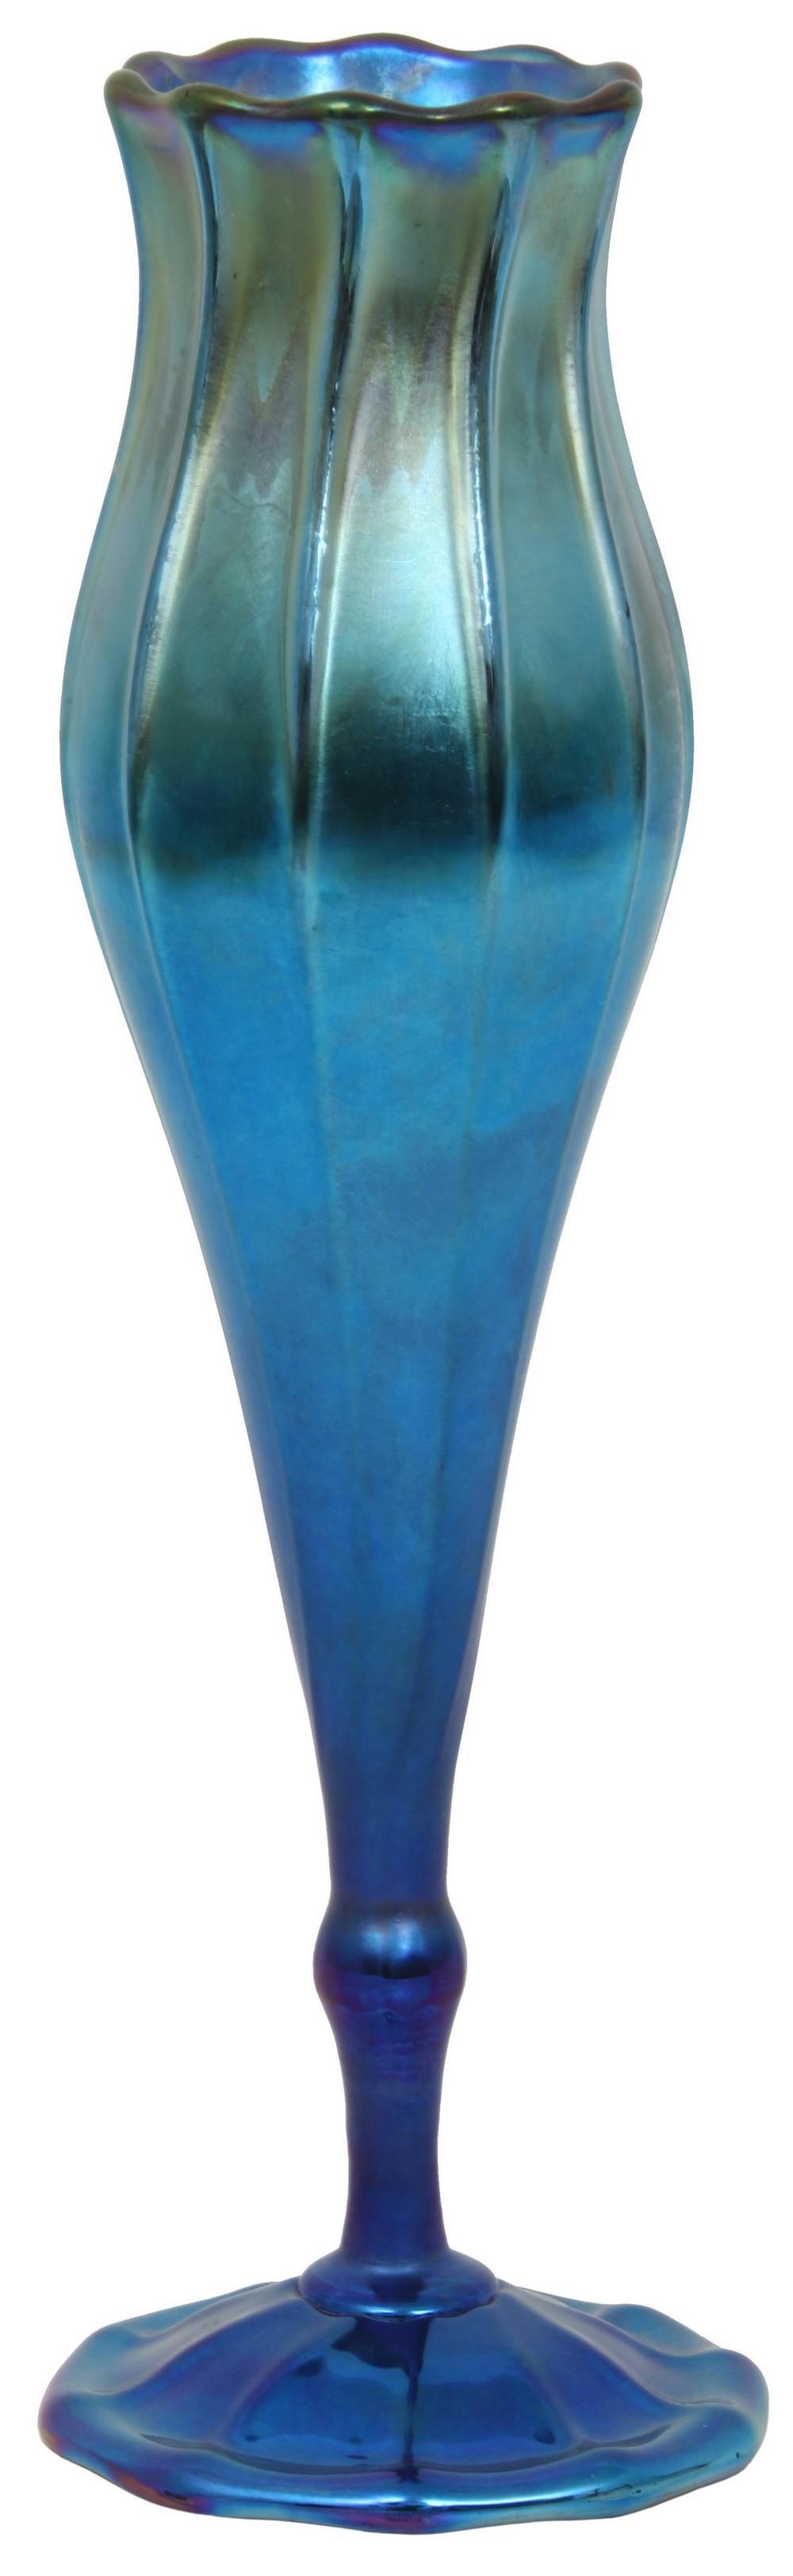 Tiffany Studios Blue Favrile Floriform Vase